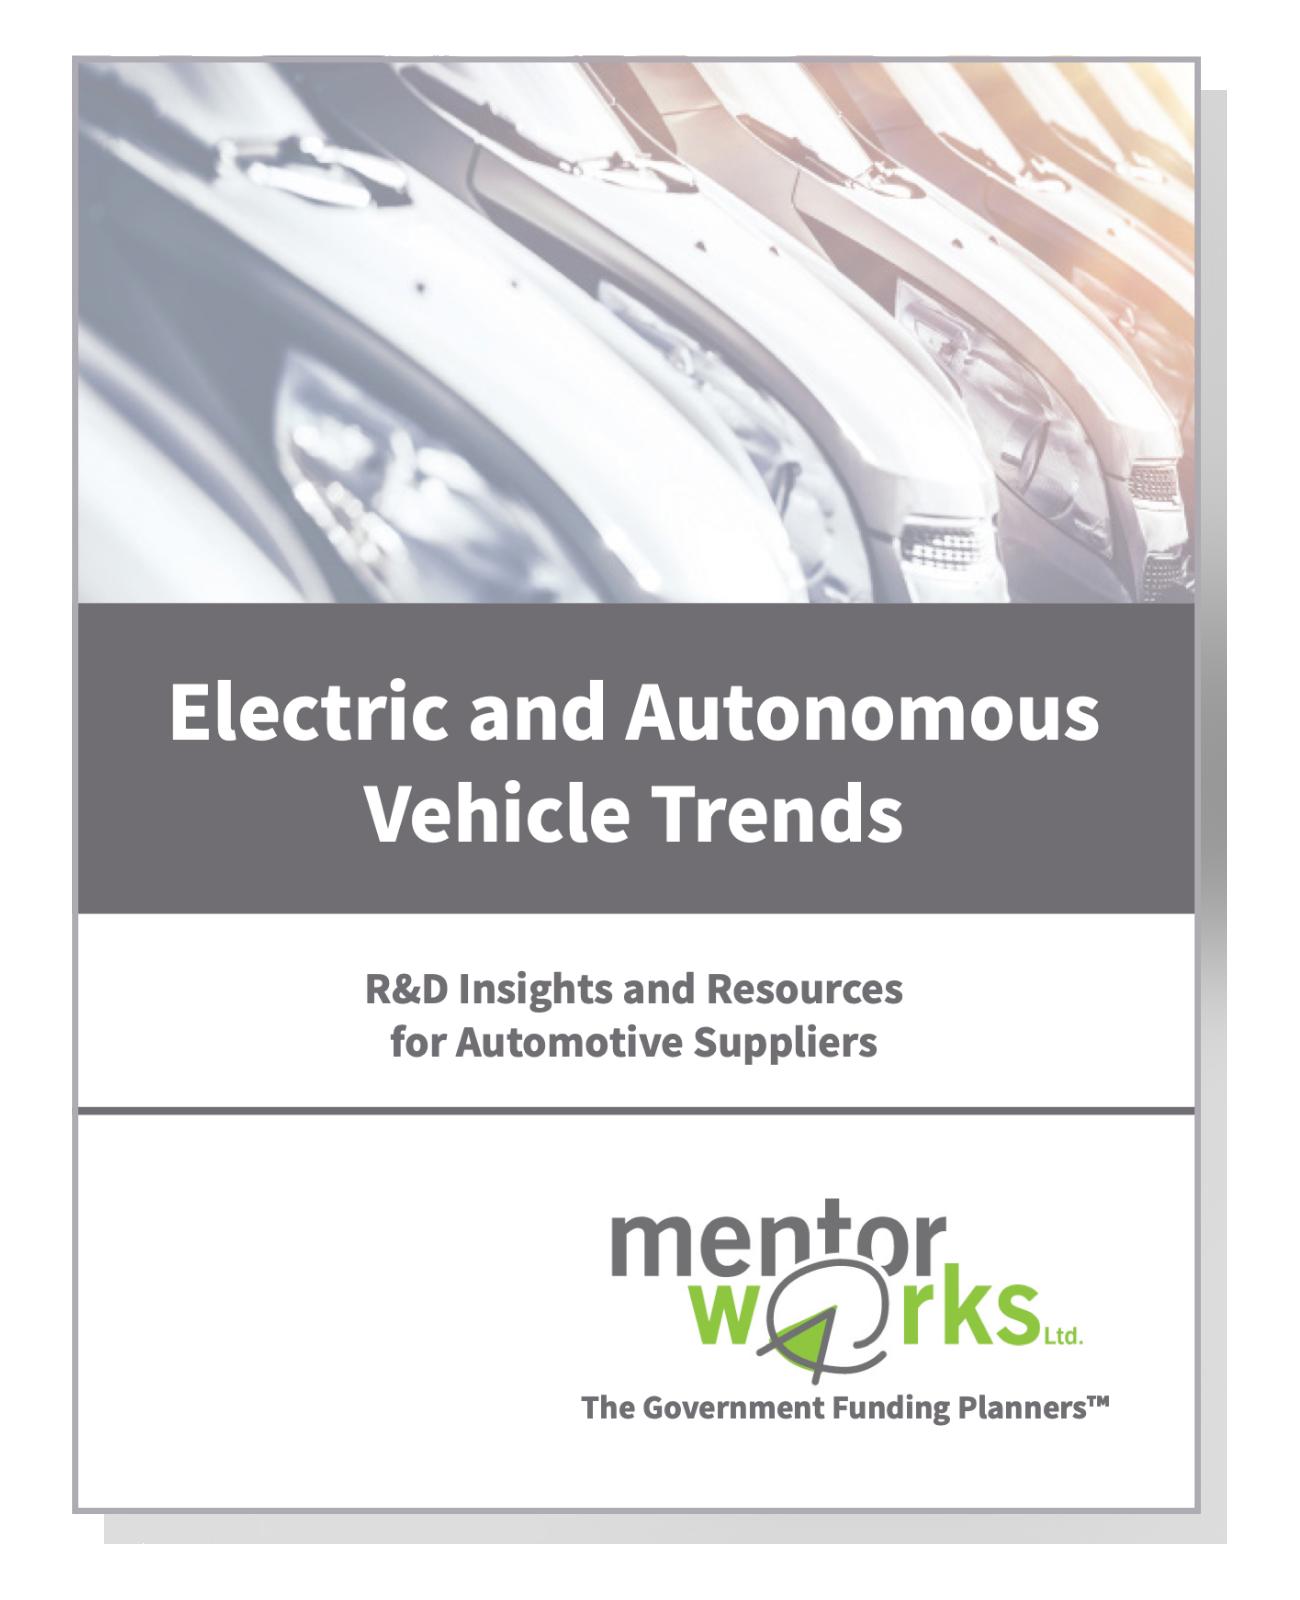 Electric and Autonomous Vehicle Trends Drop Shadow